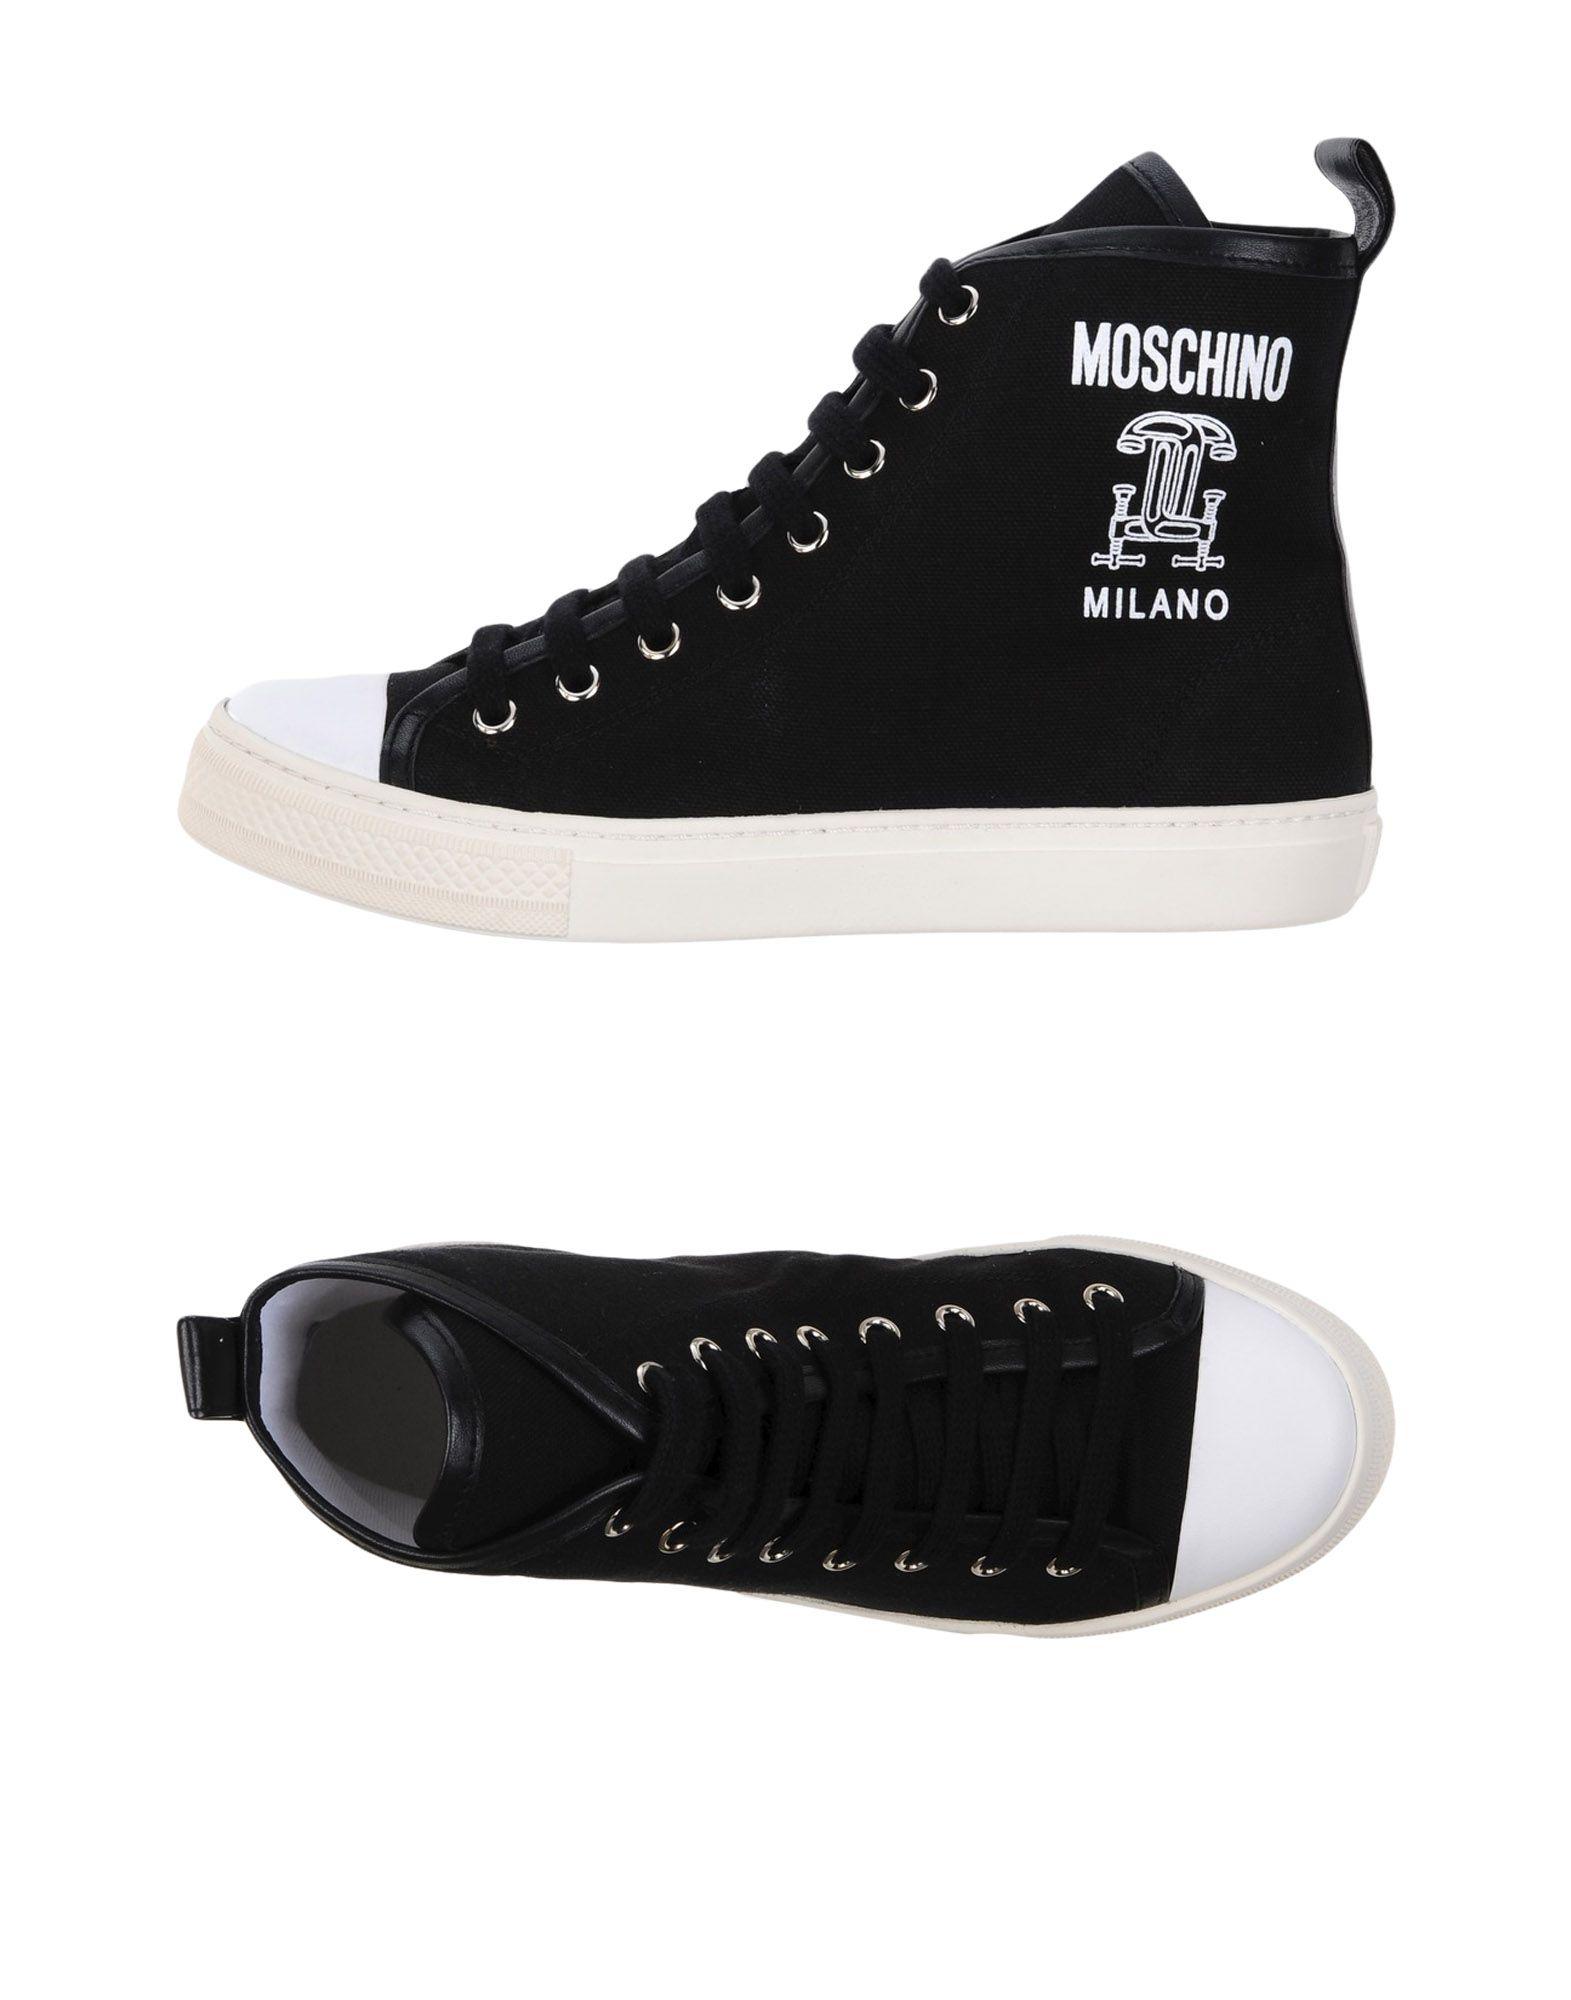 Stilvolle billige Schuhe Moschino Sneakers Damen  11284303FV